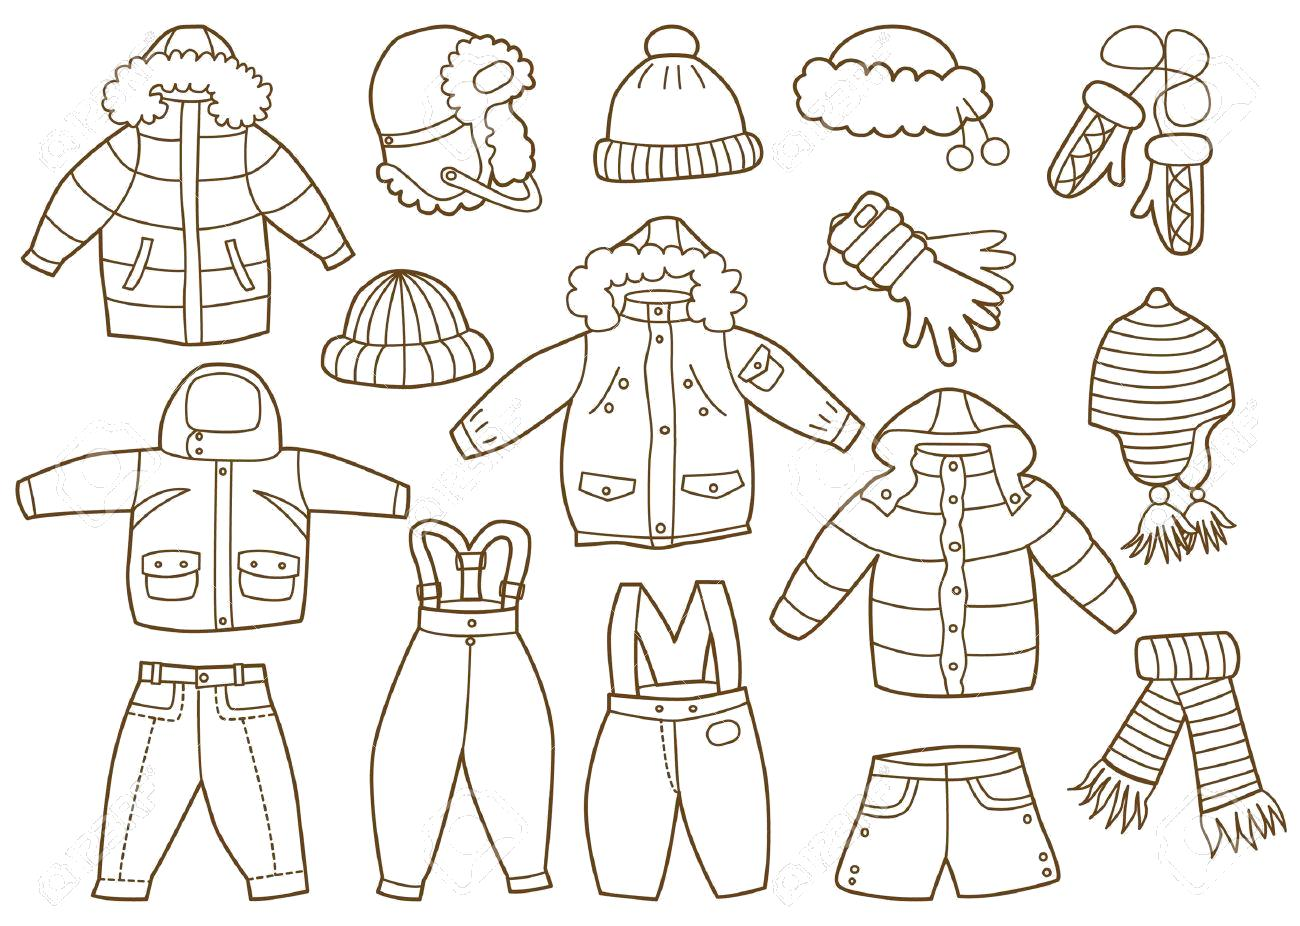 Раскраска зимняя одежда  . Скачать Зимняя одежда.  Распечатать Зимняя одежда